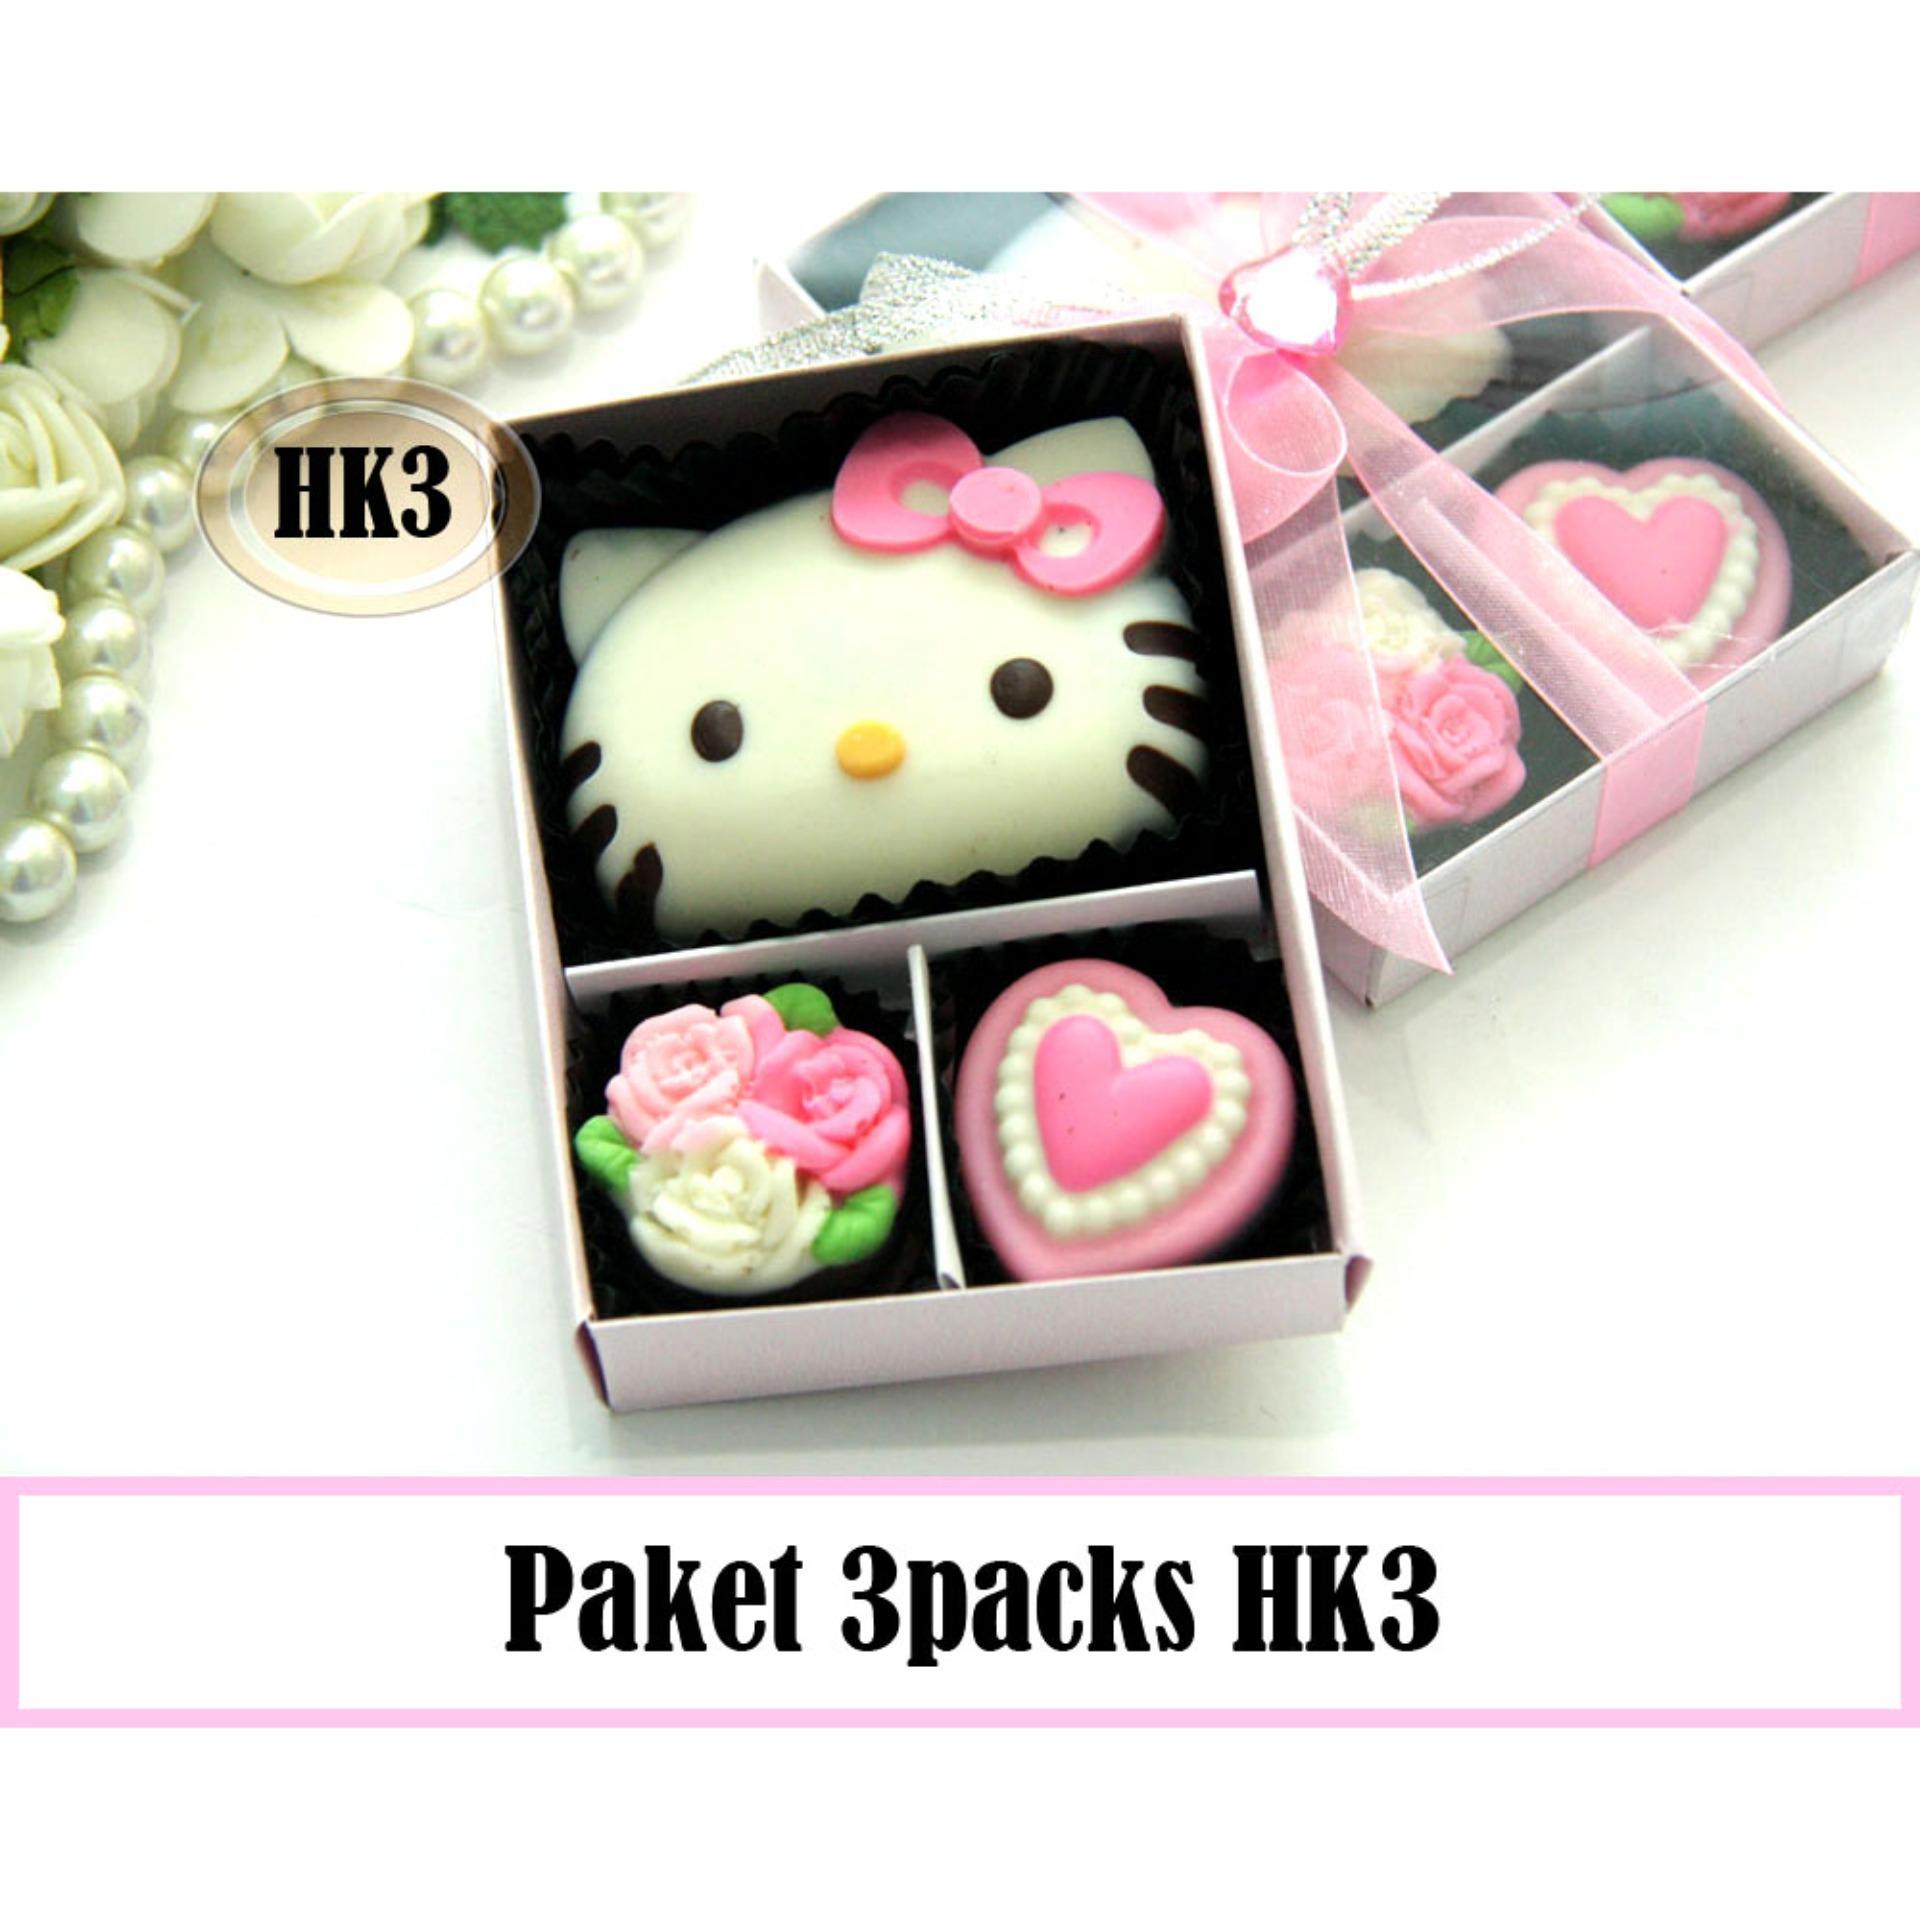 Trulychoco Paket Coklat Love Editions Hk3 3Packs Pink Trulychoco Diskon 40